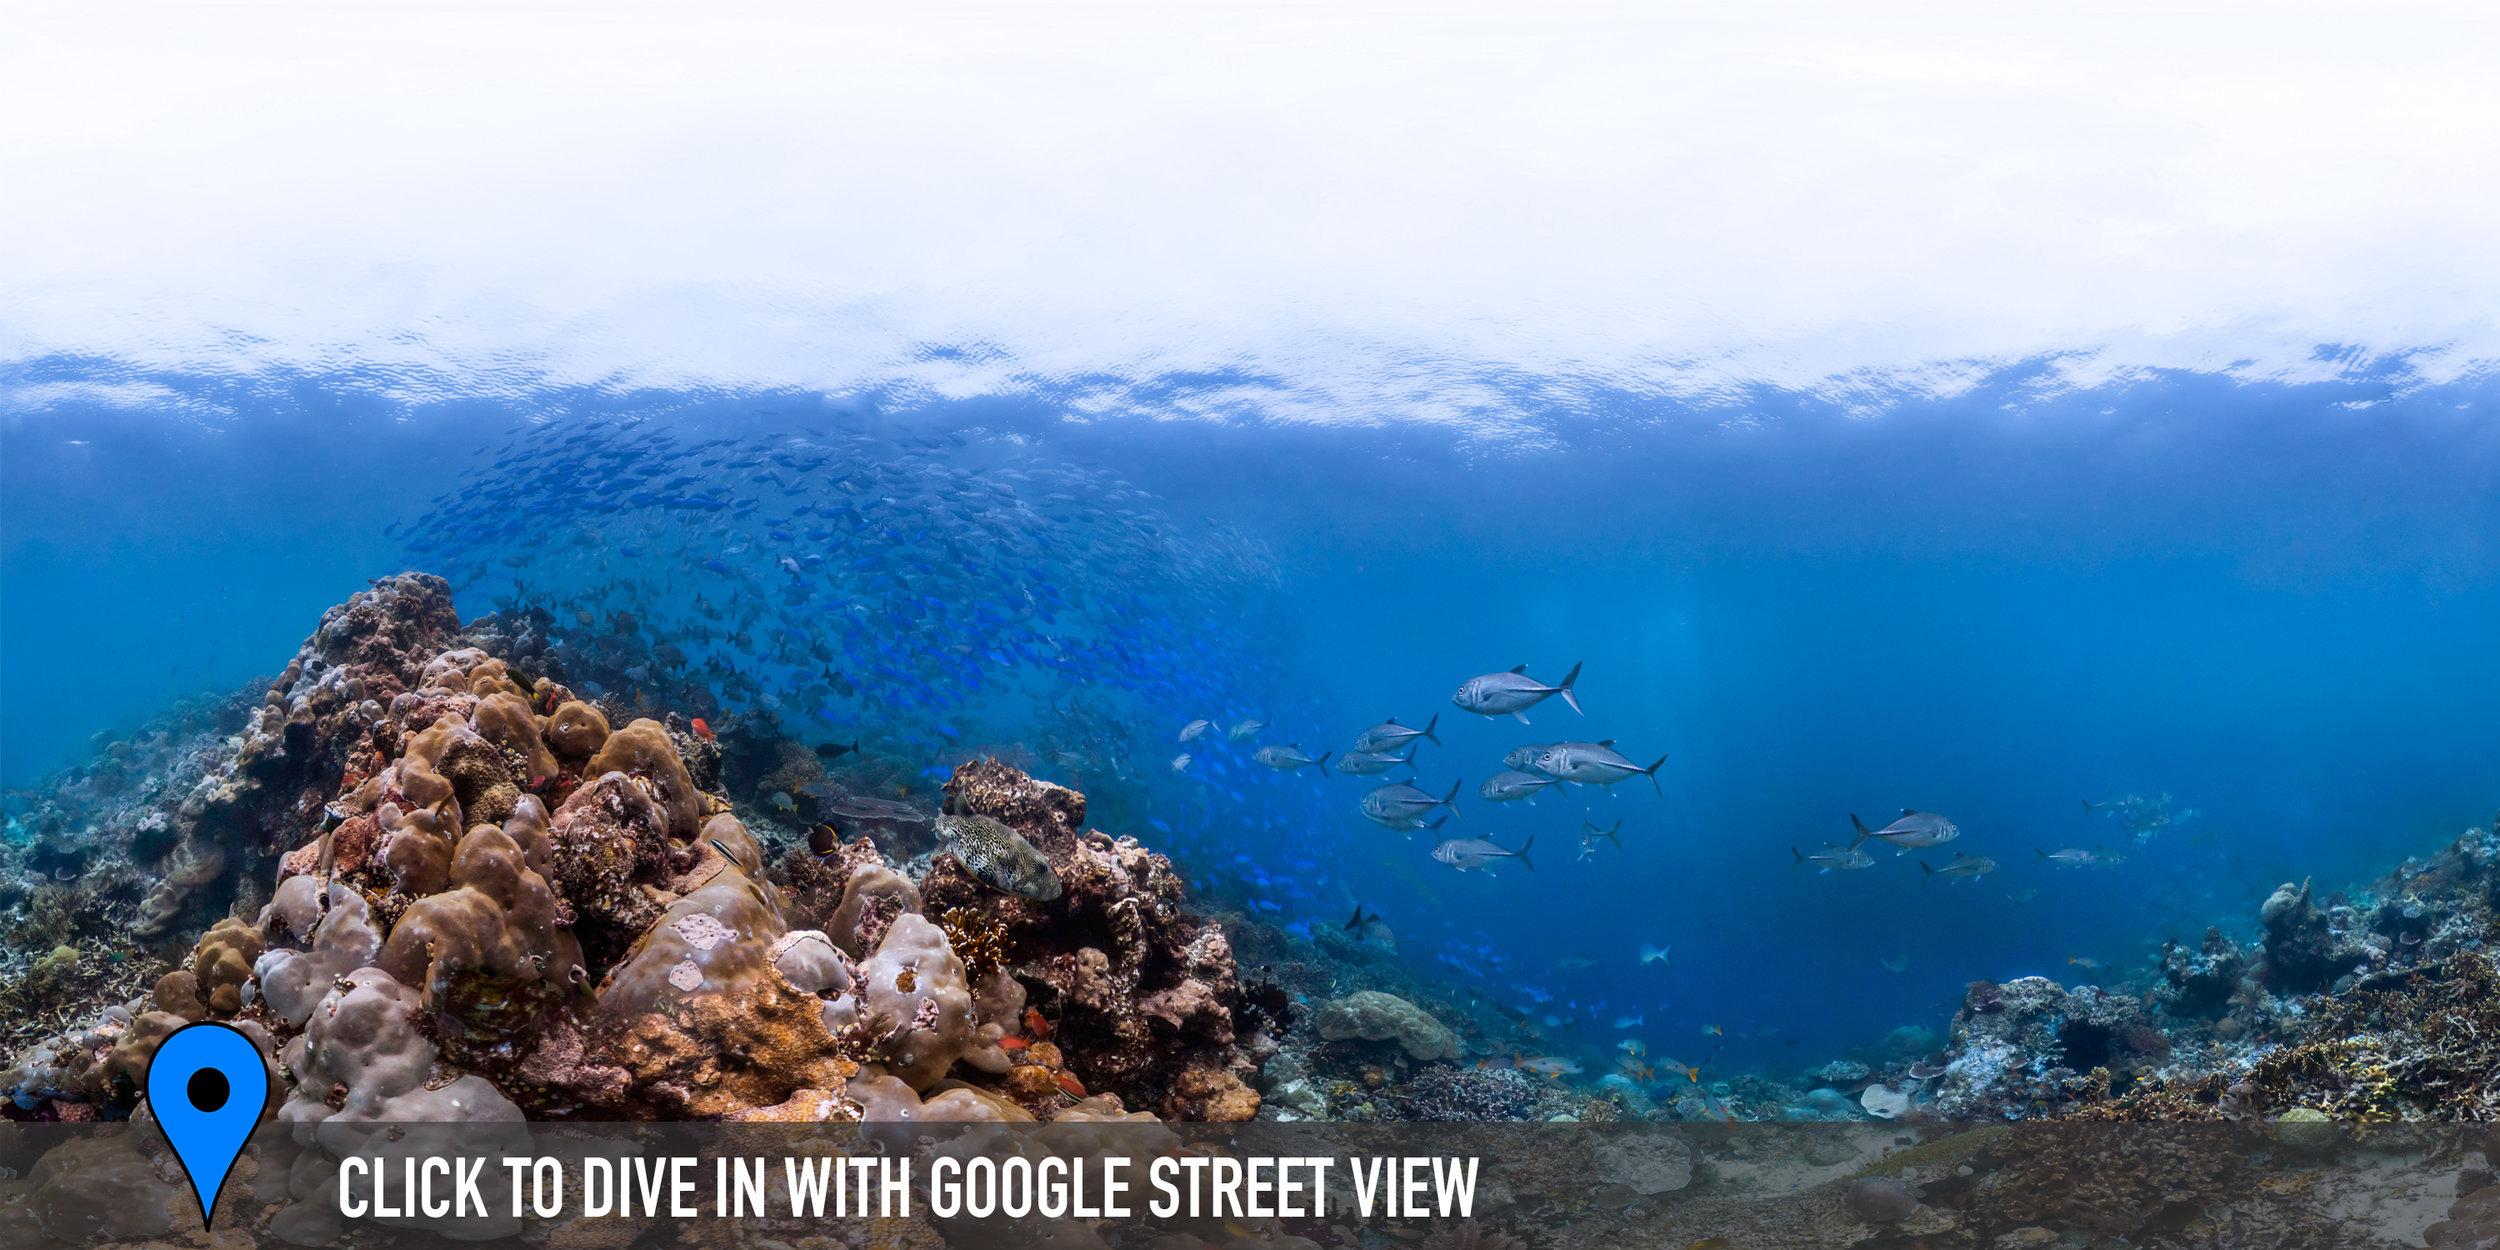 CAPE KRI, INDONESIA CREDIT: THE OCEAN AGENCY / XL CATLIN SEAVIEW SURVEY